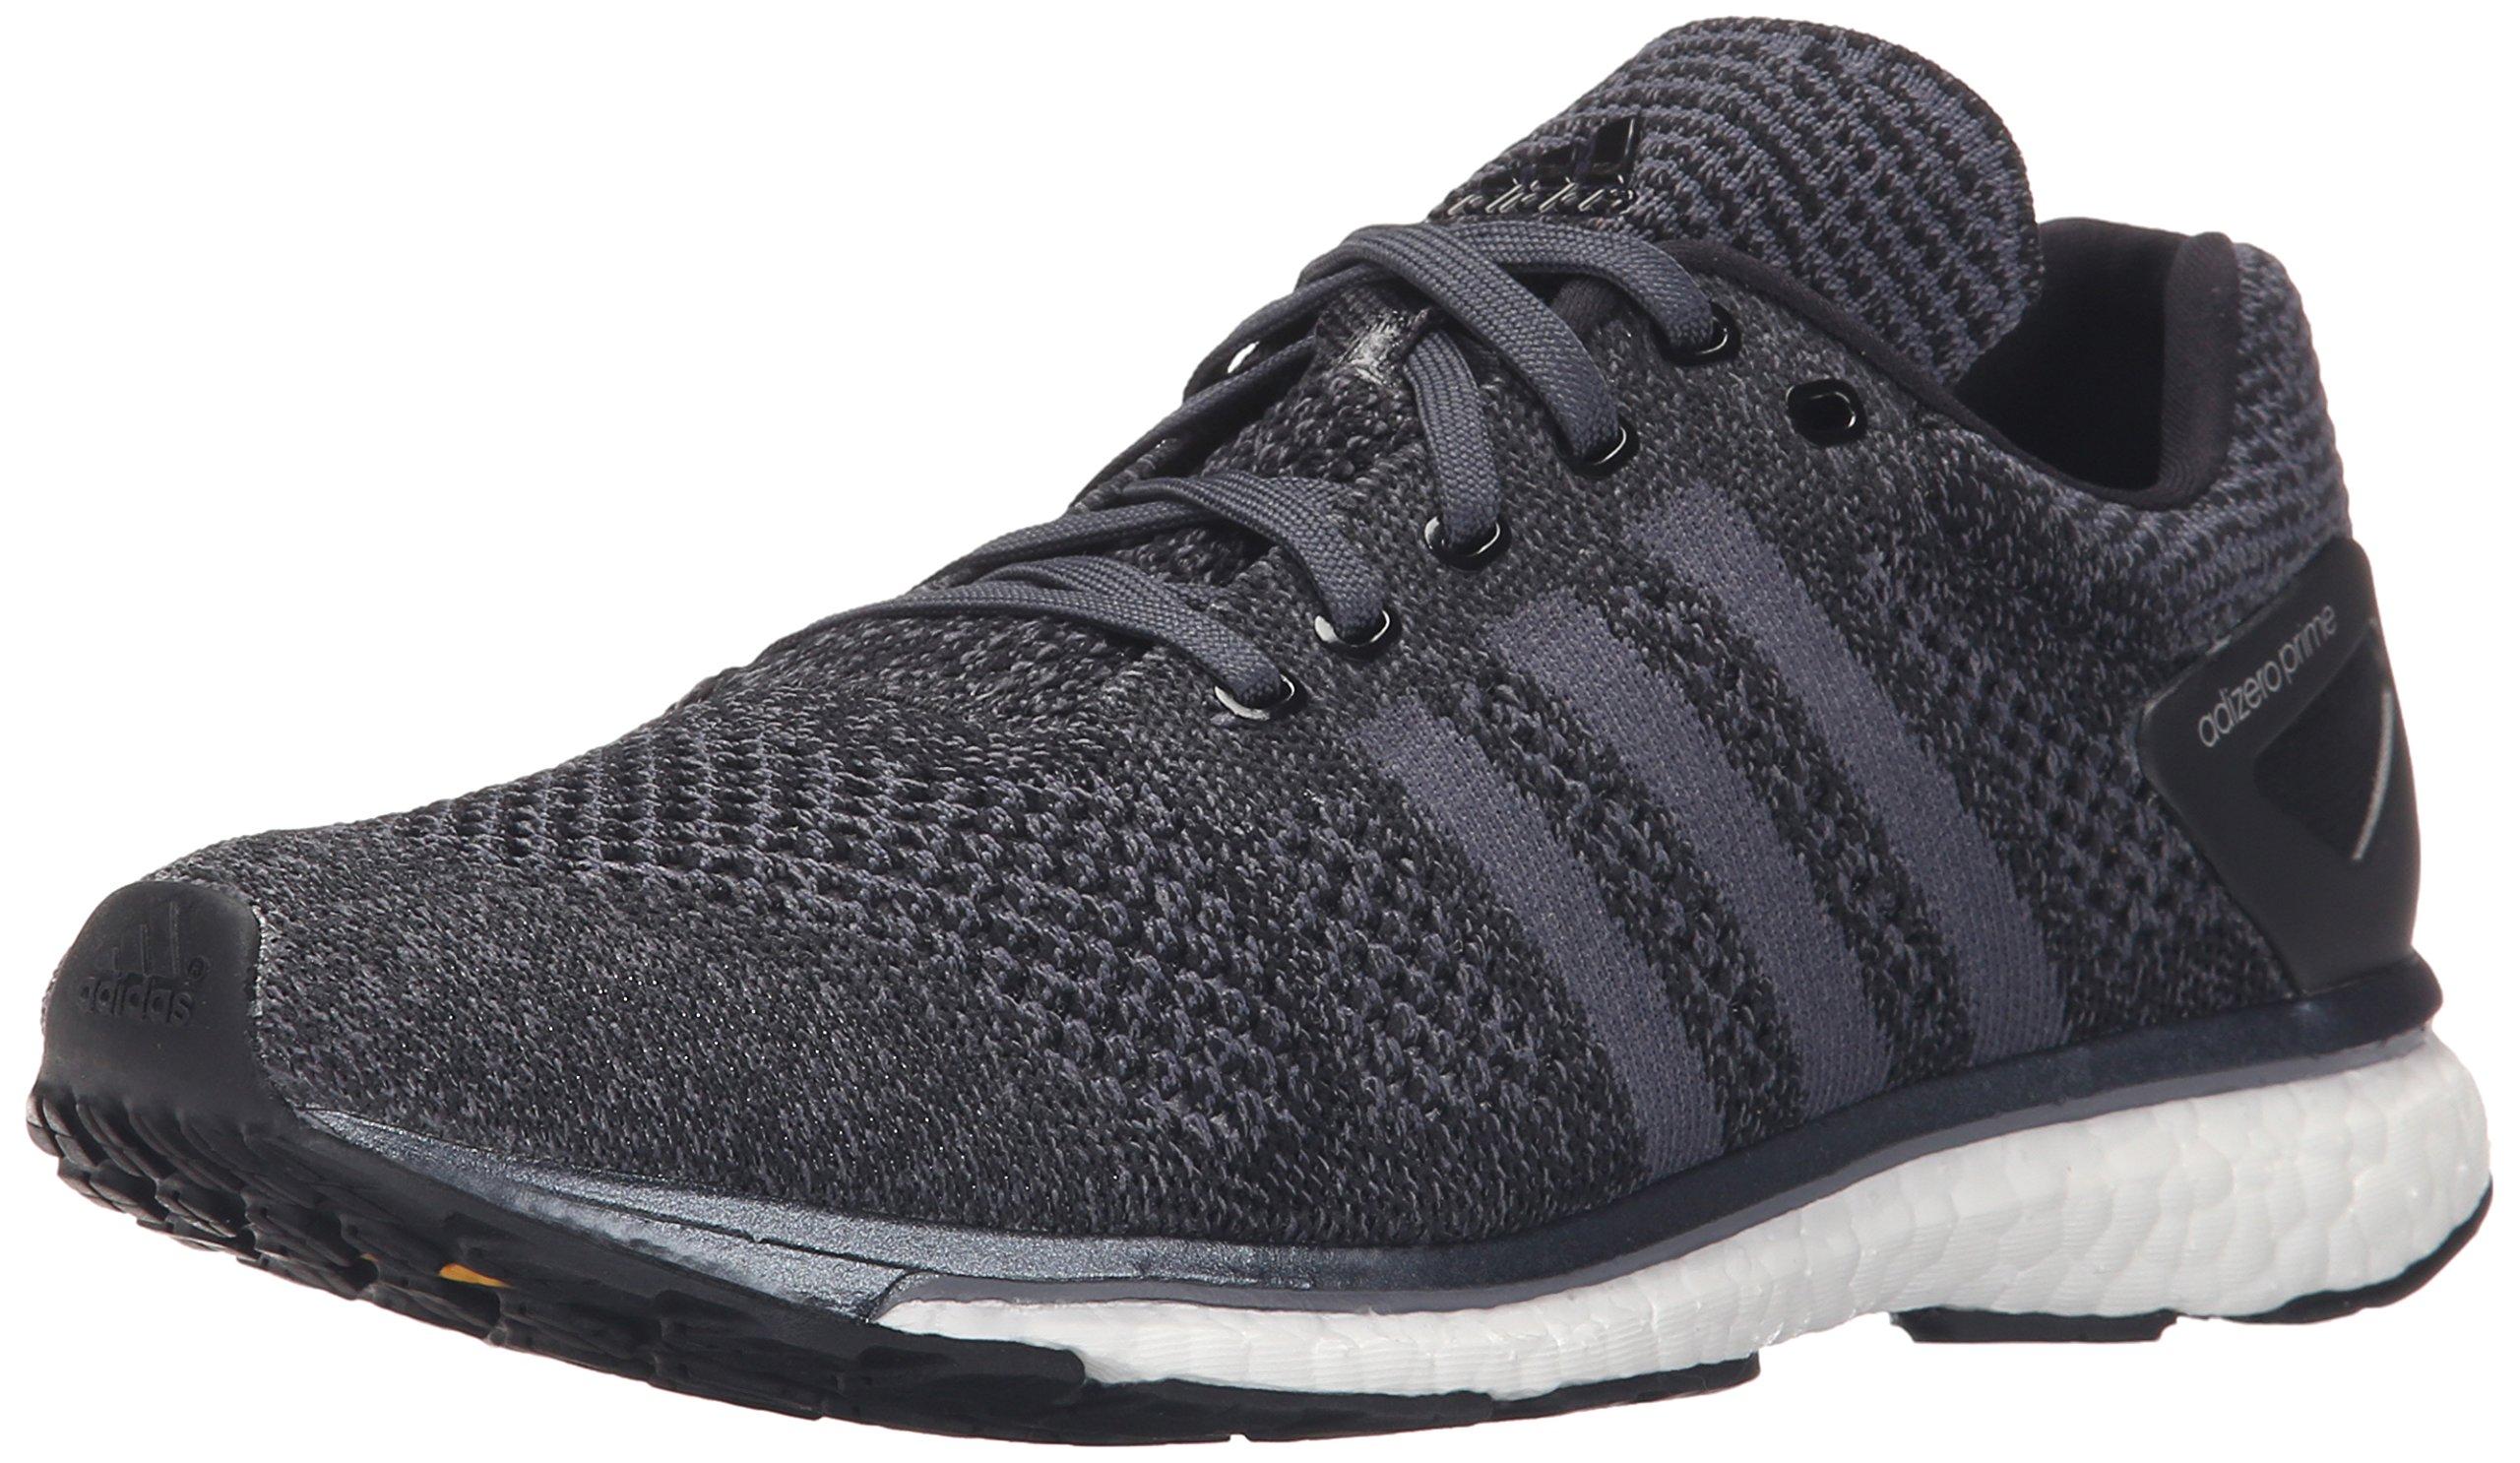 designer fashion c6bea ef3a0 Galleon - Adidas Performance Adizero Prime LTD Running Shoe ,BlackWhiteBlack,7 M US